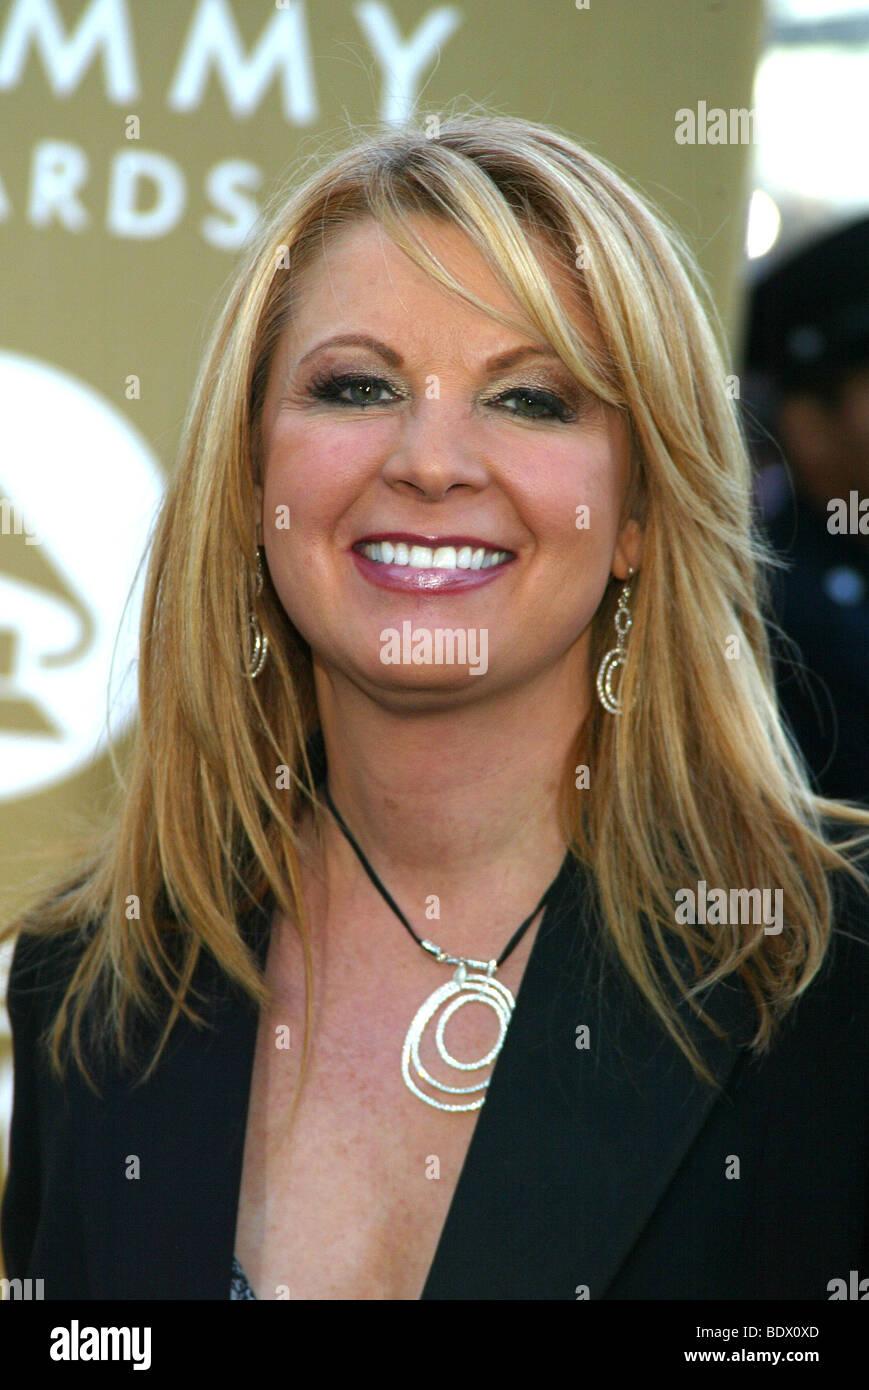 PATTI LOVELESS - US singer - Stock Image